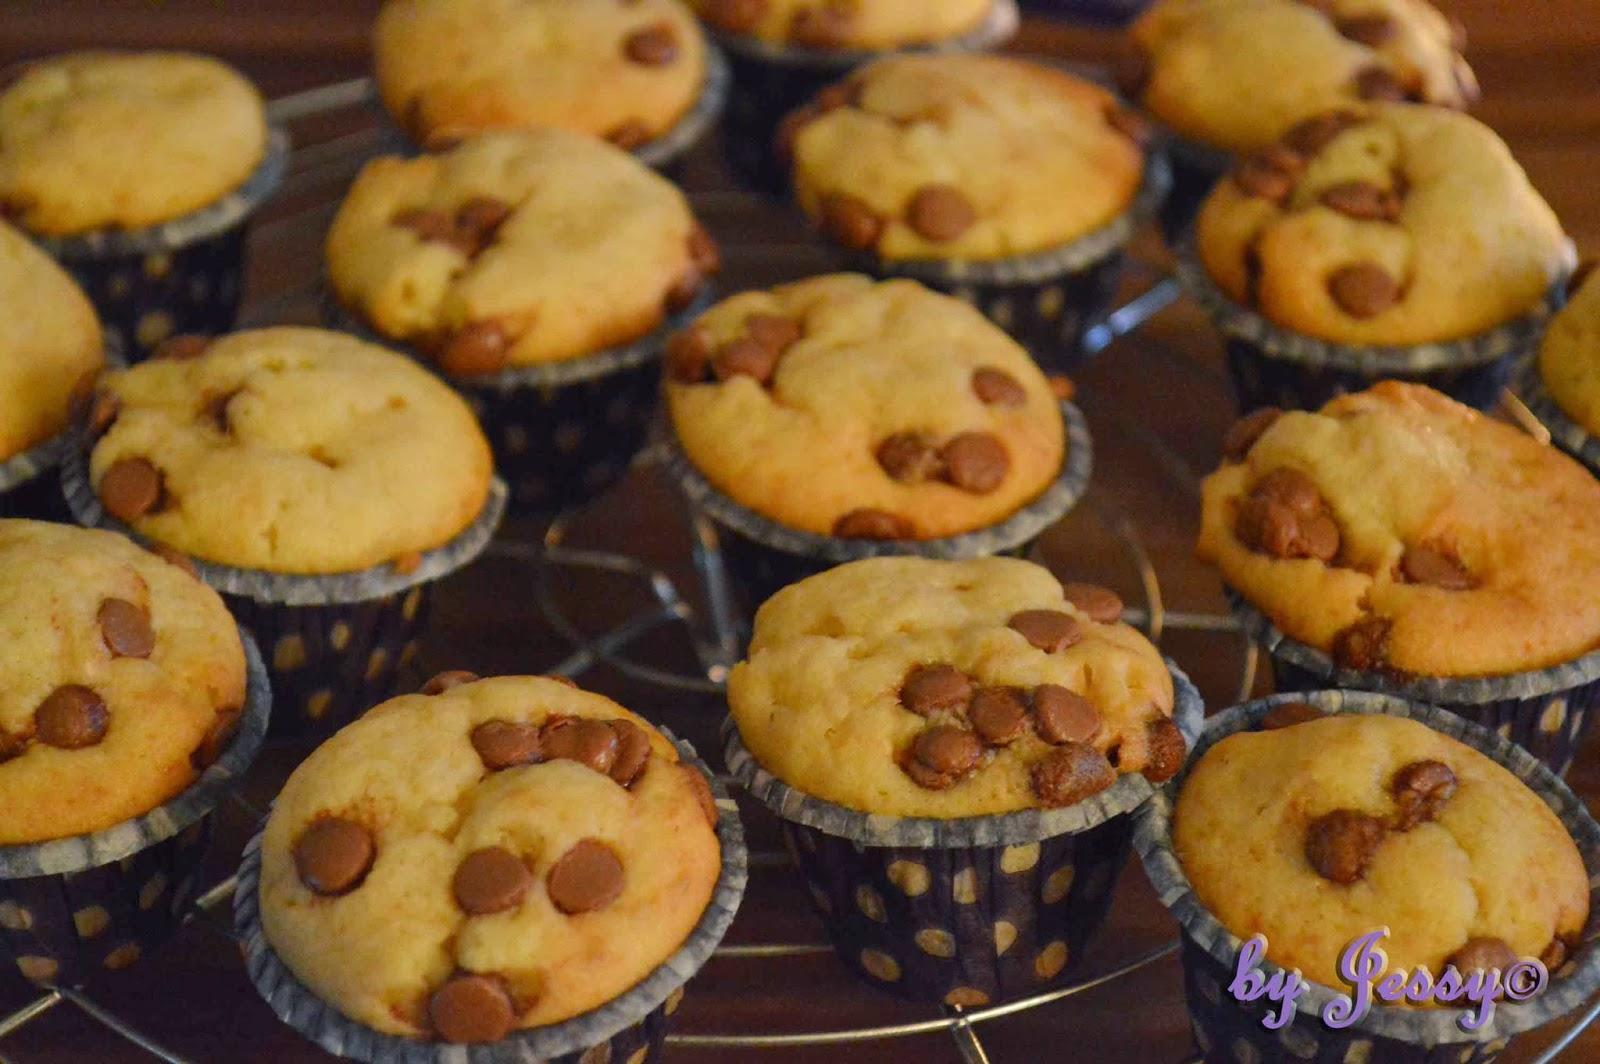 be creative backen und kochen produkttest milka mini muffins. Black Bedroom Furniture Sets. Home Design Ideas